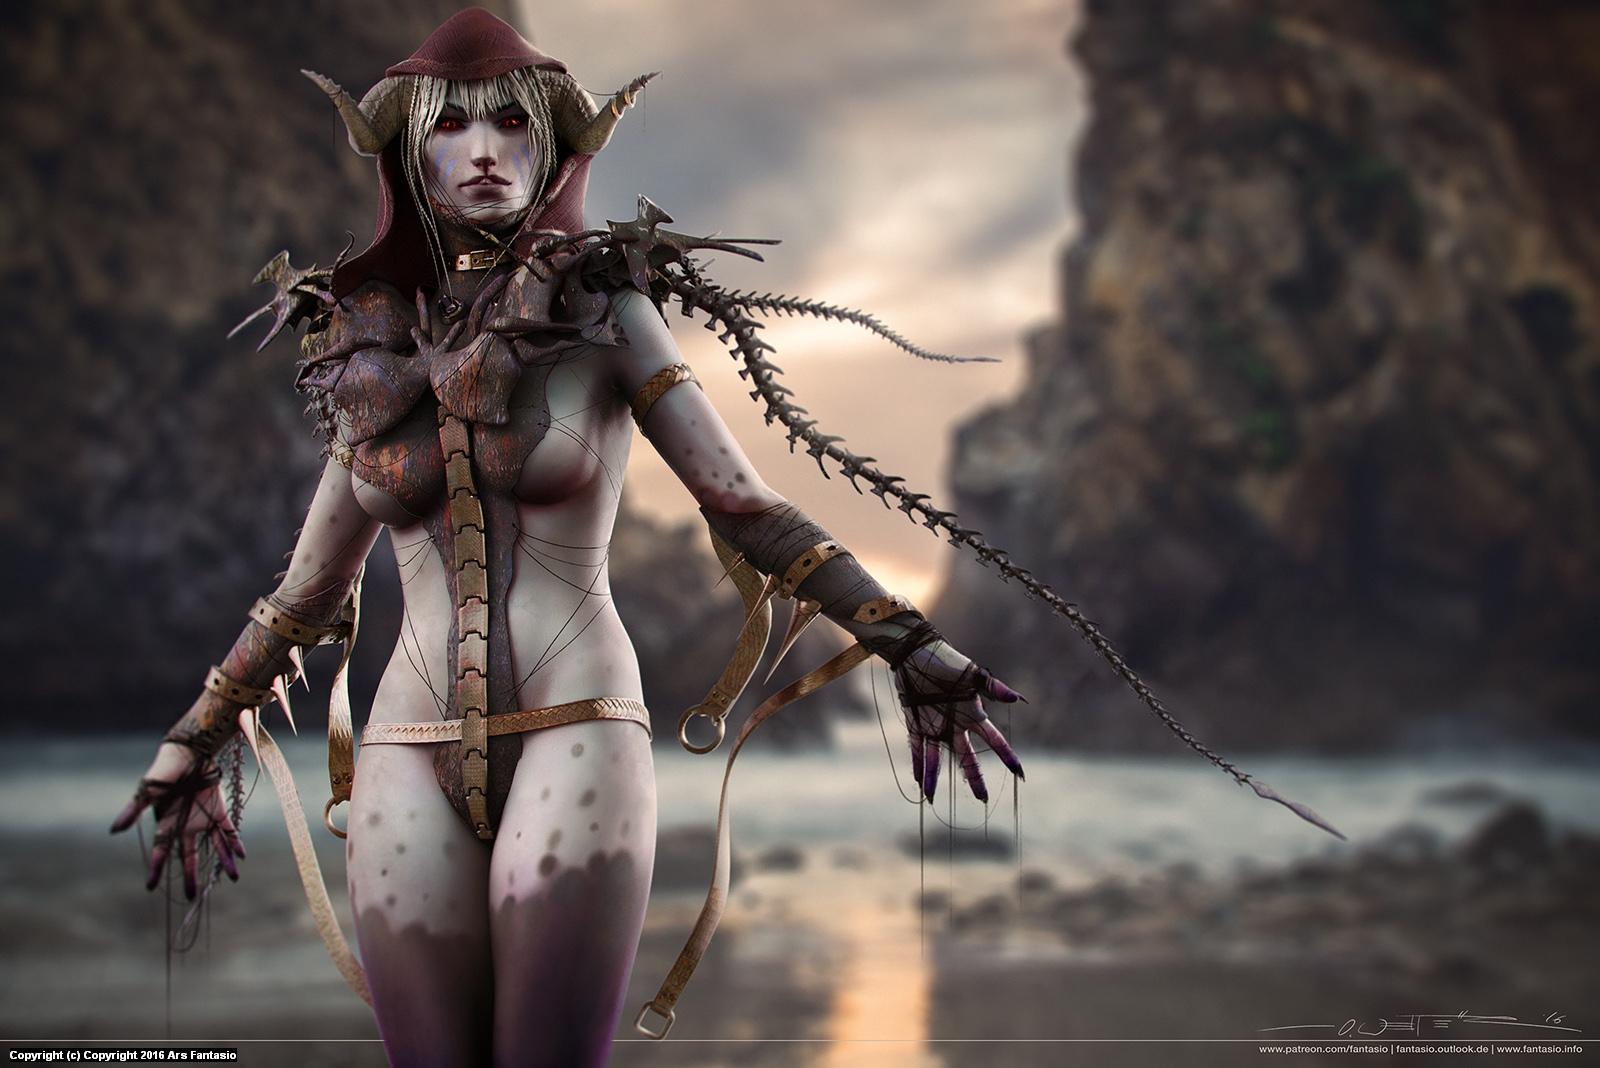 Demon Warrior Concept Artwork by Oliver Wetter